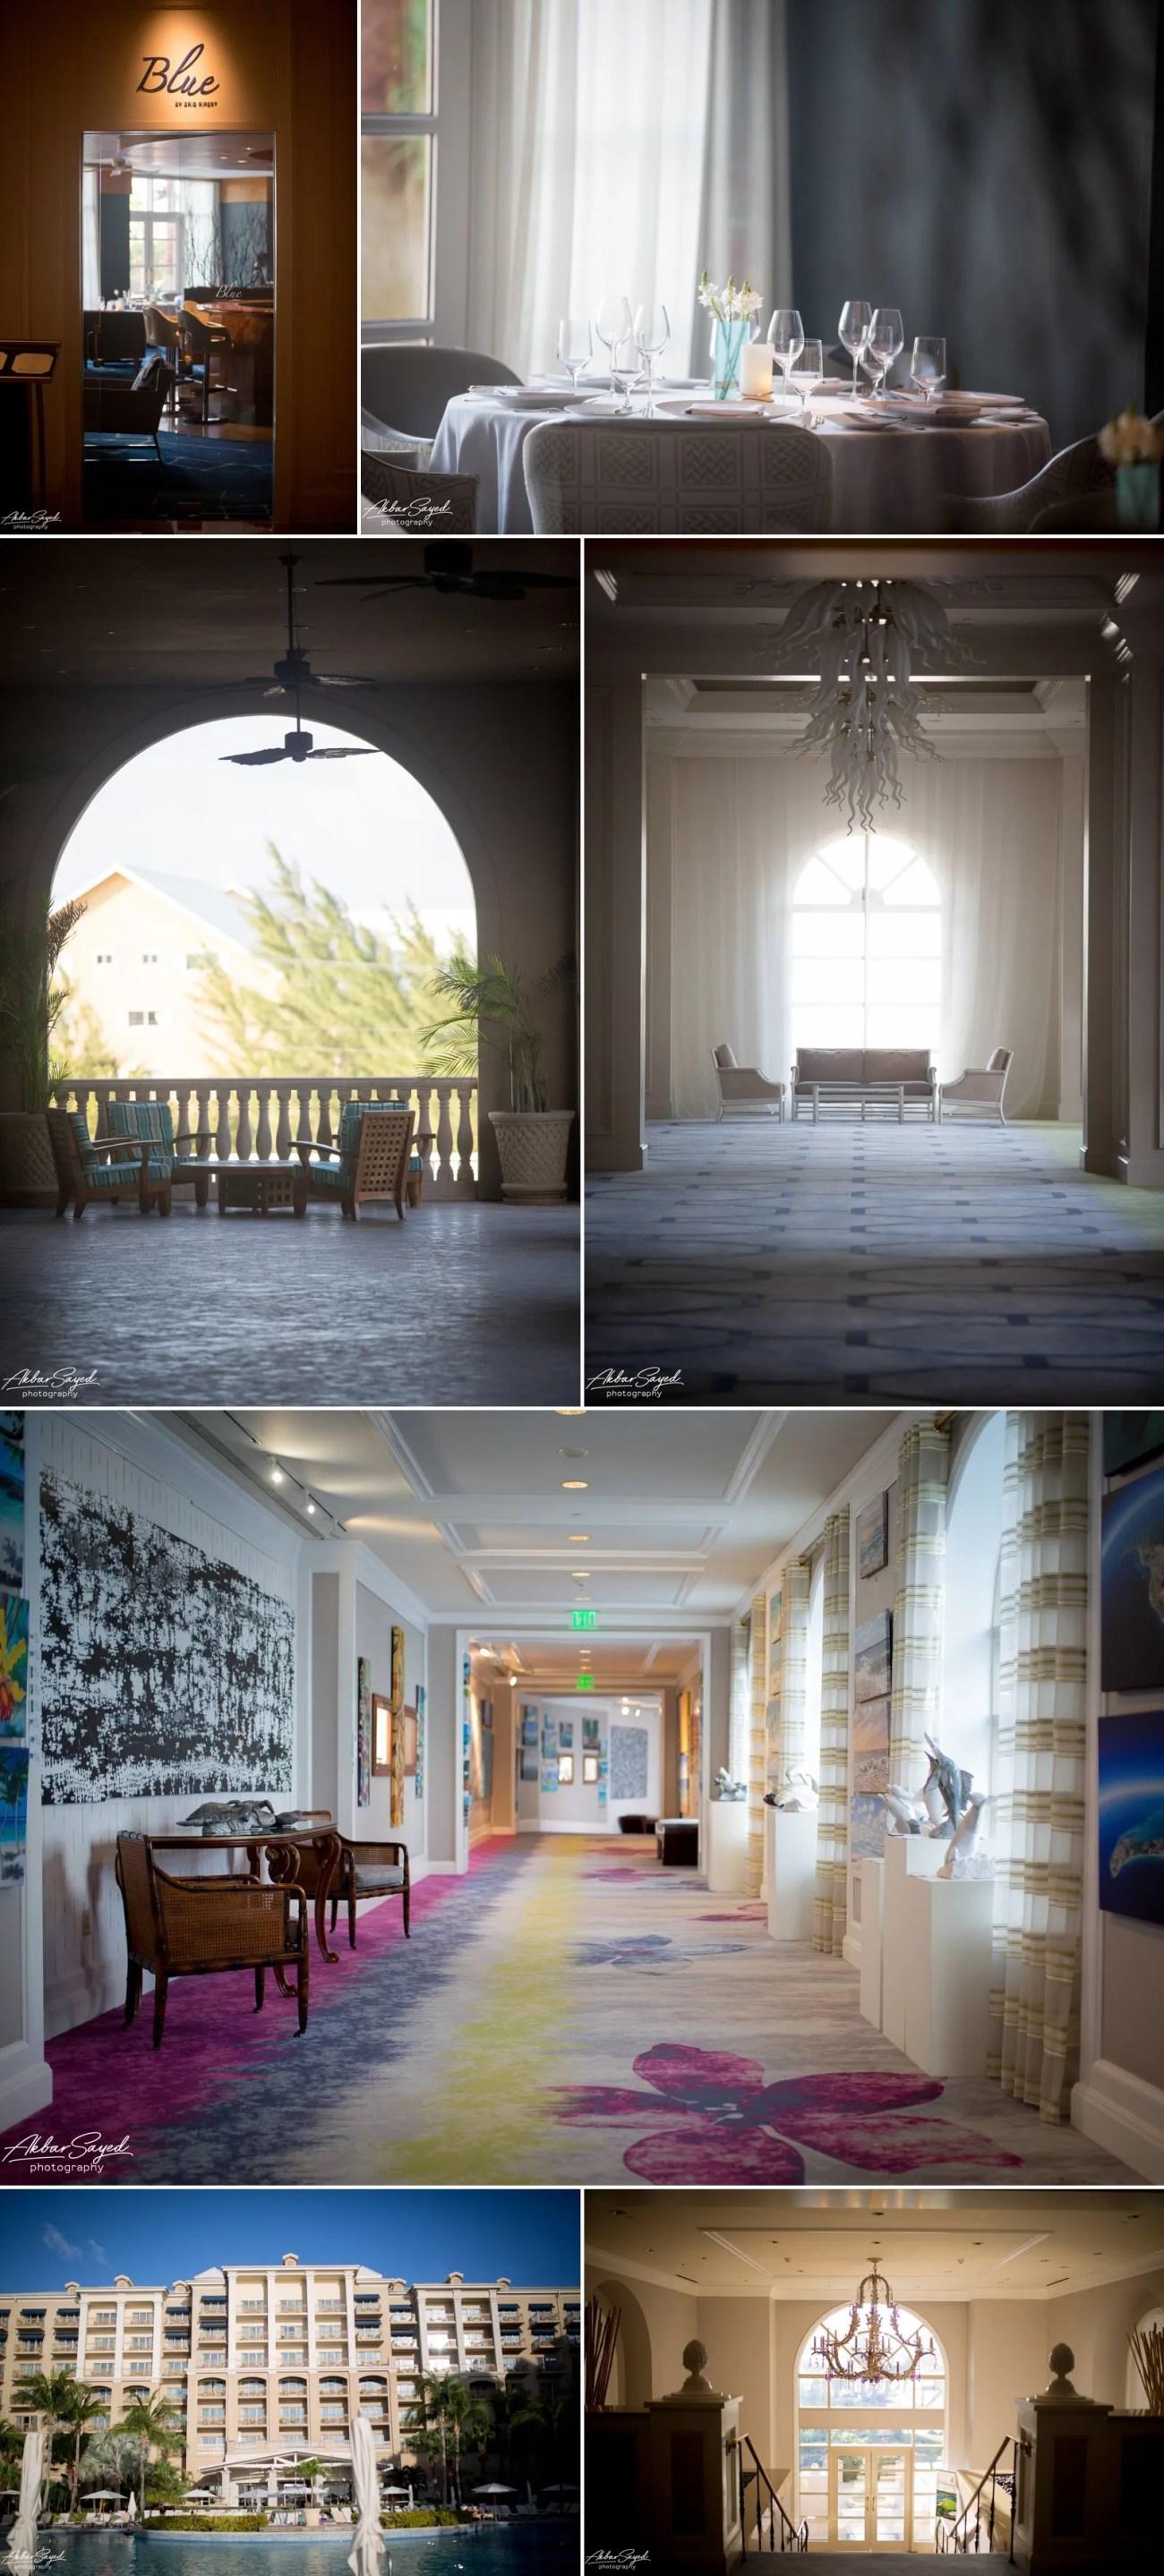 The Ritz-Carlton, Grand Cayman - South Asian Destination Wedding Venue 4